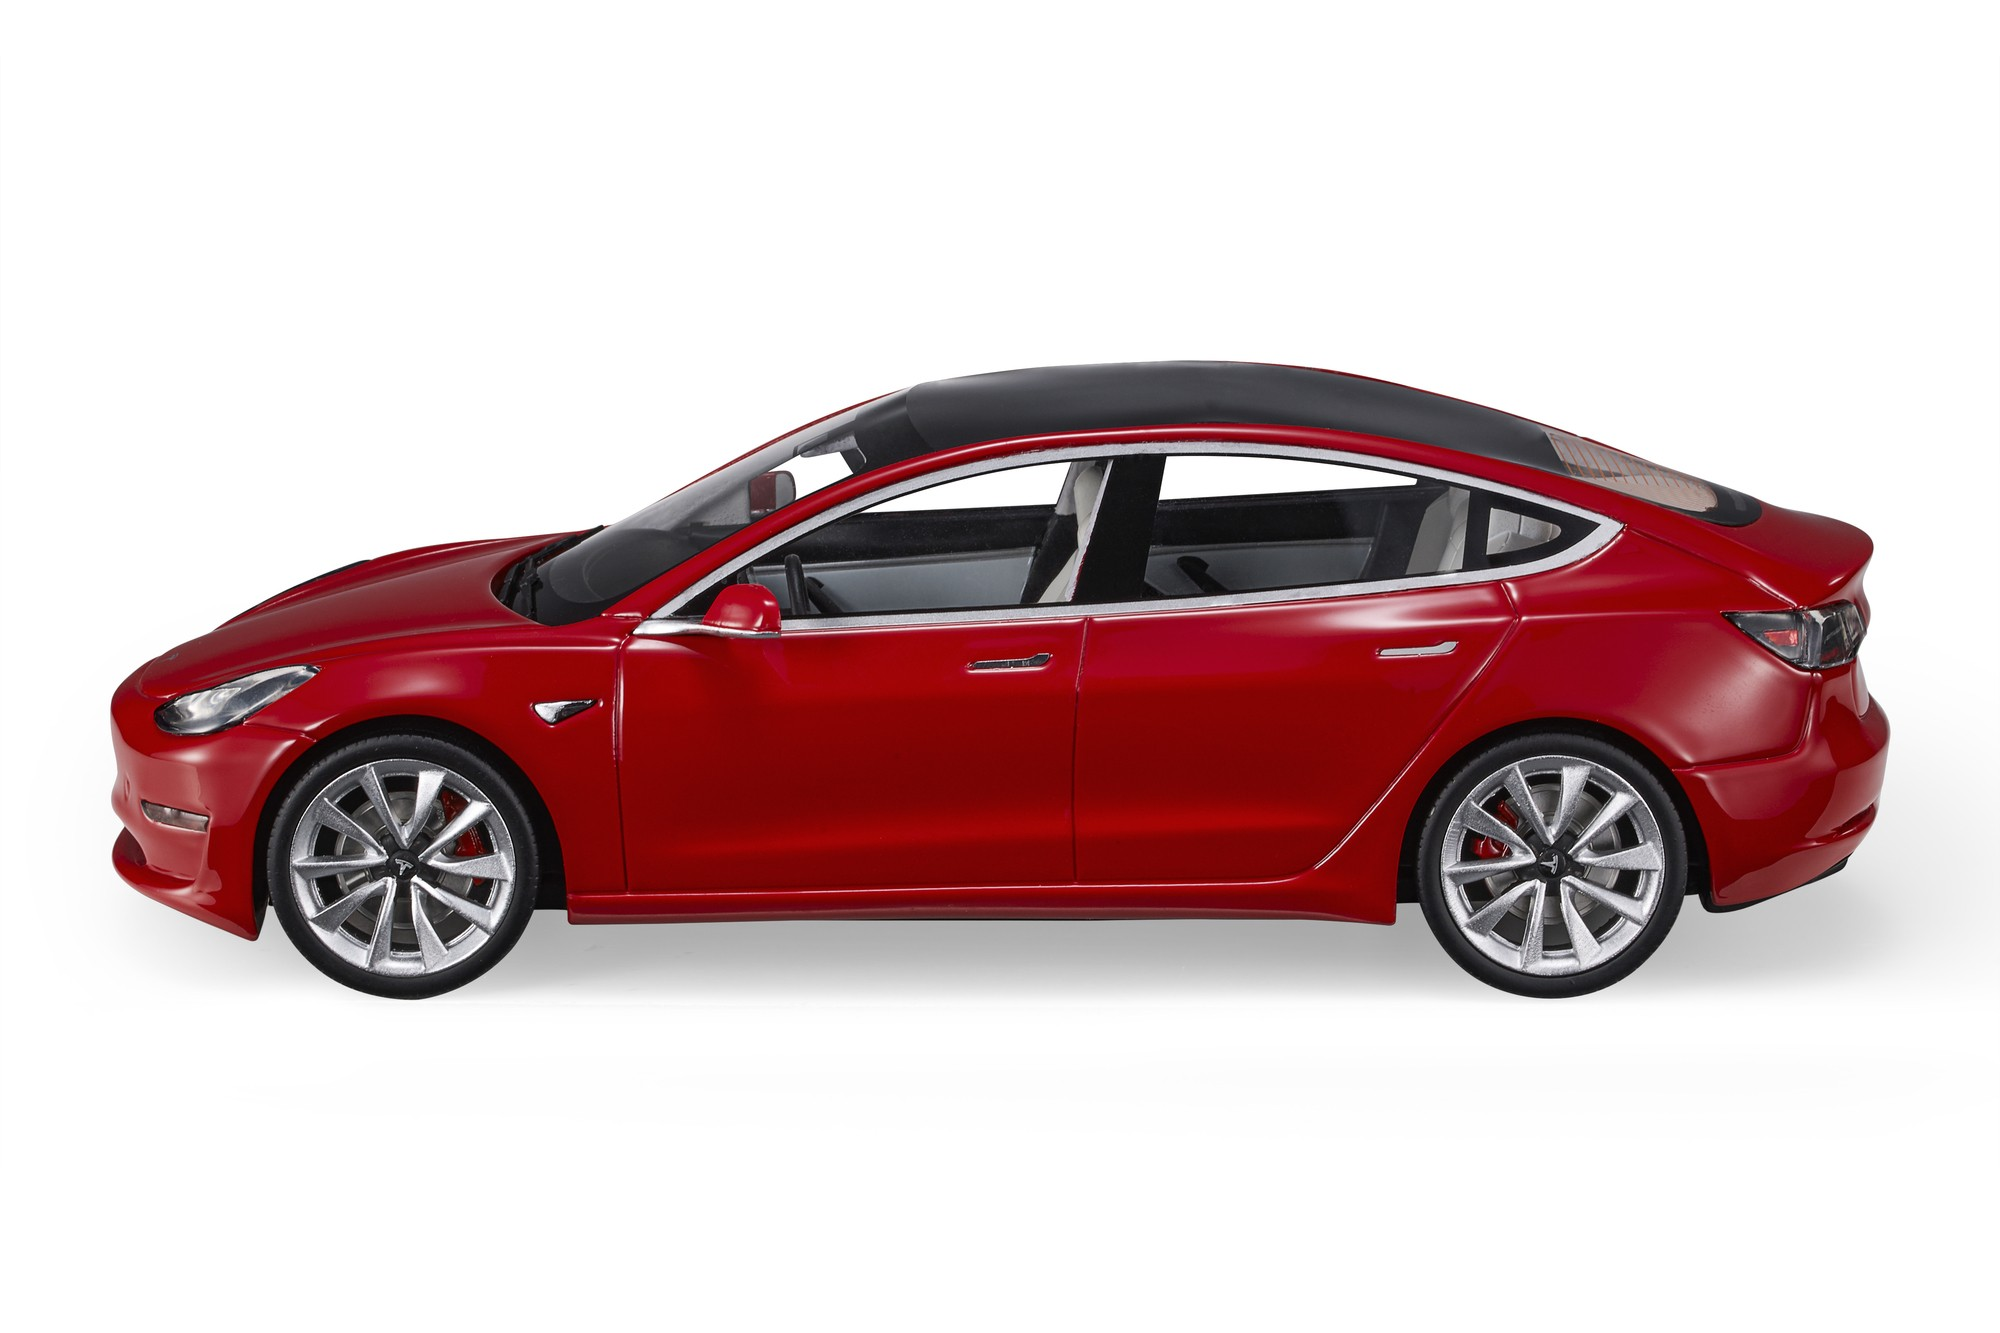 LS Collectibles Tesla Model 3 (Pre-order), 1:18 red   LS074A